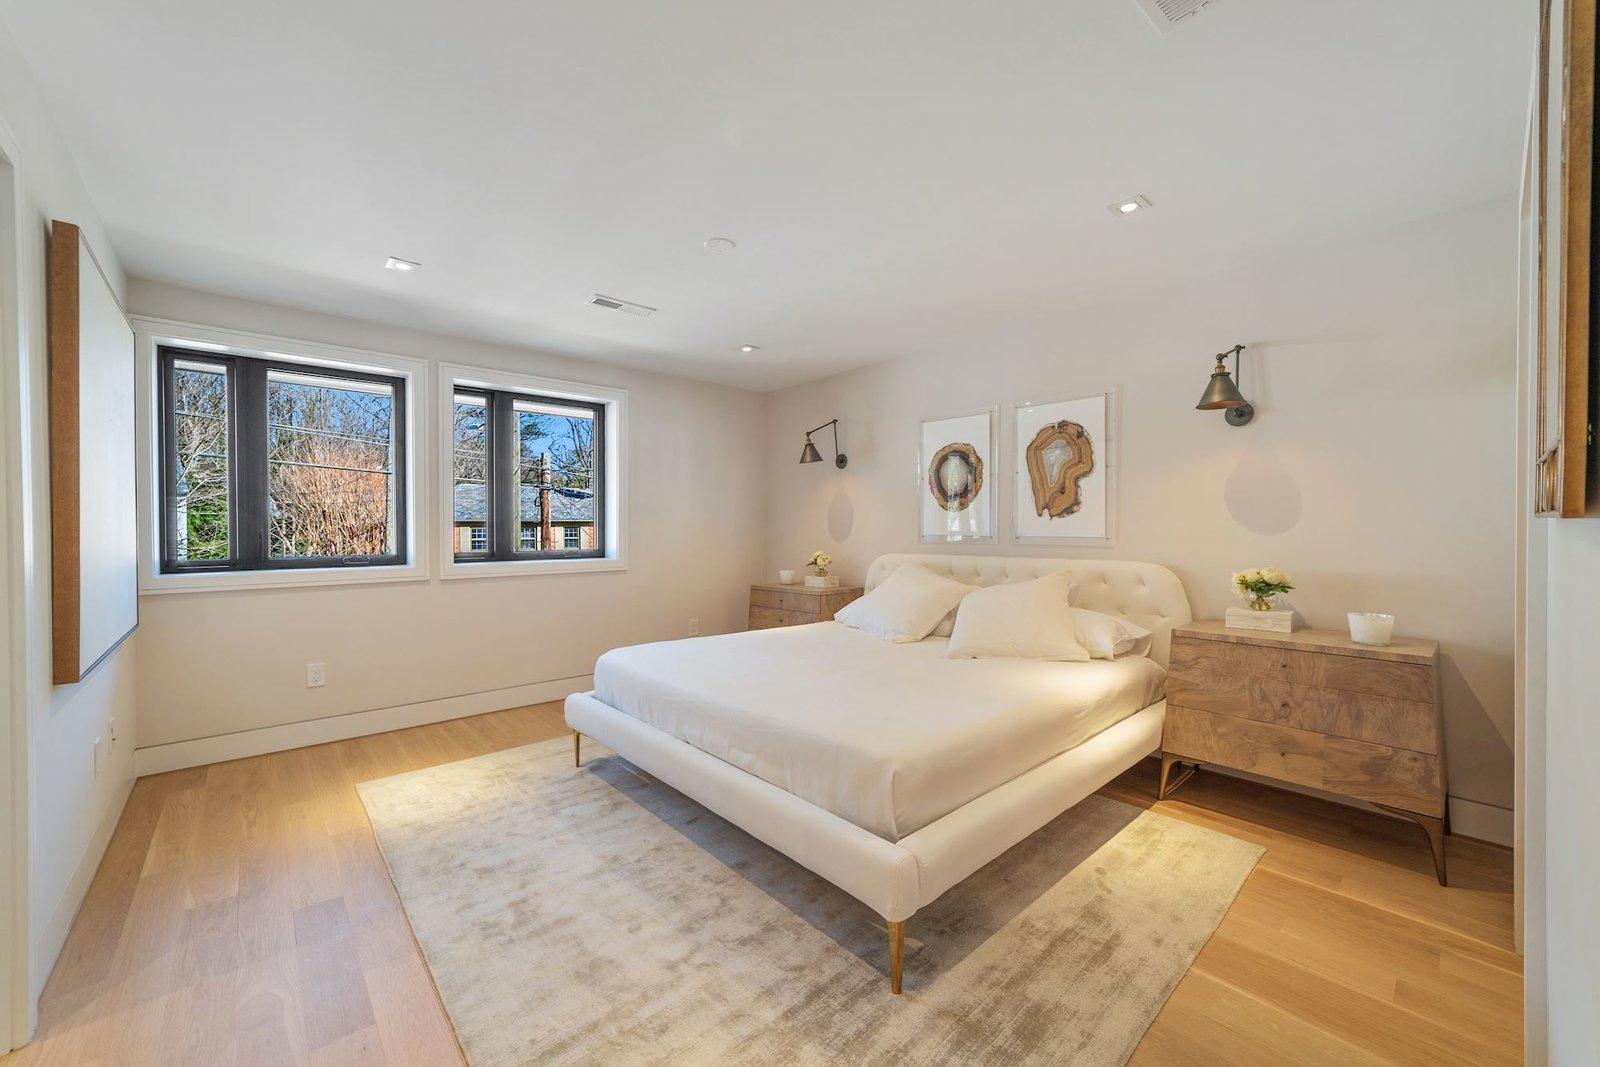 2908 Ellicott St bedroom